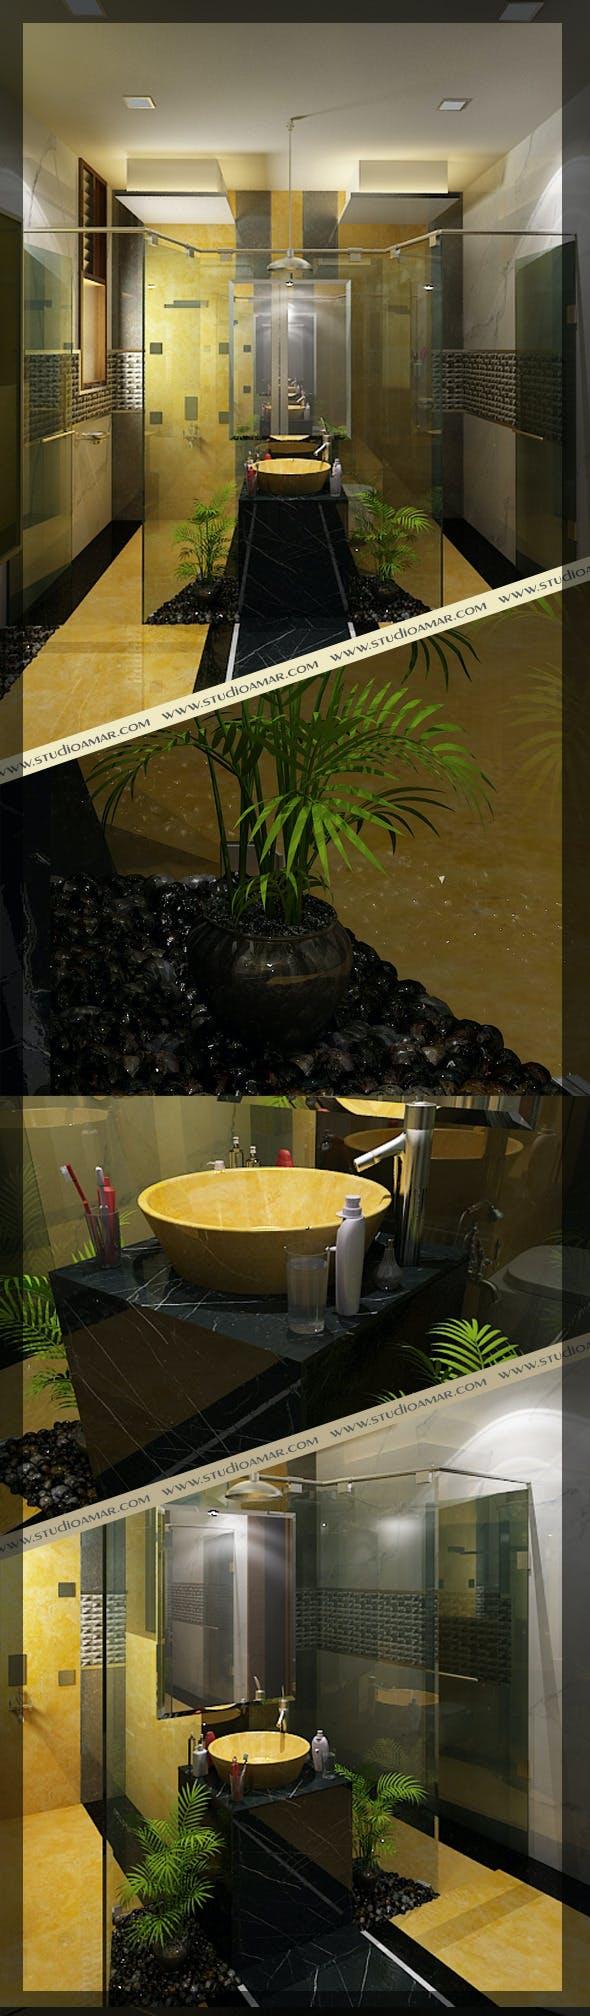 Realistic Bathroom 118 - 3DOcean Item for Sale